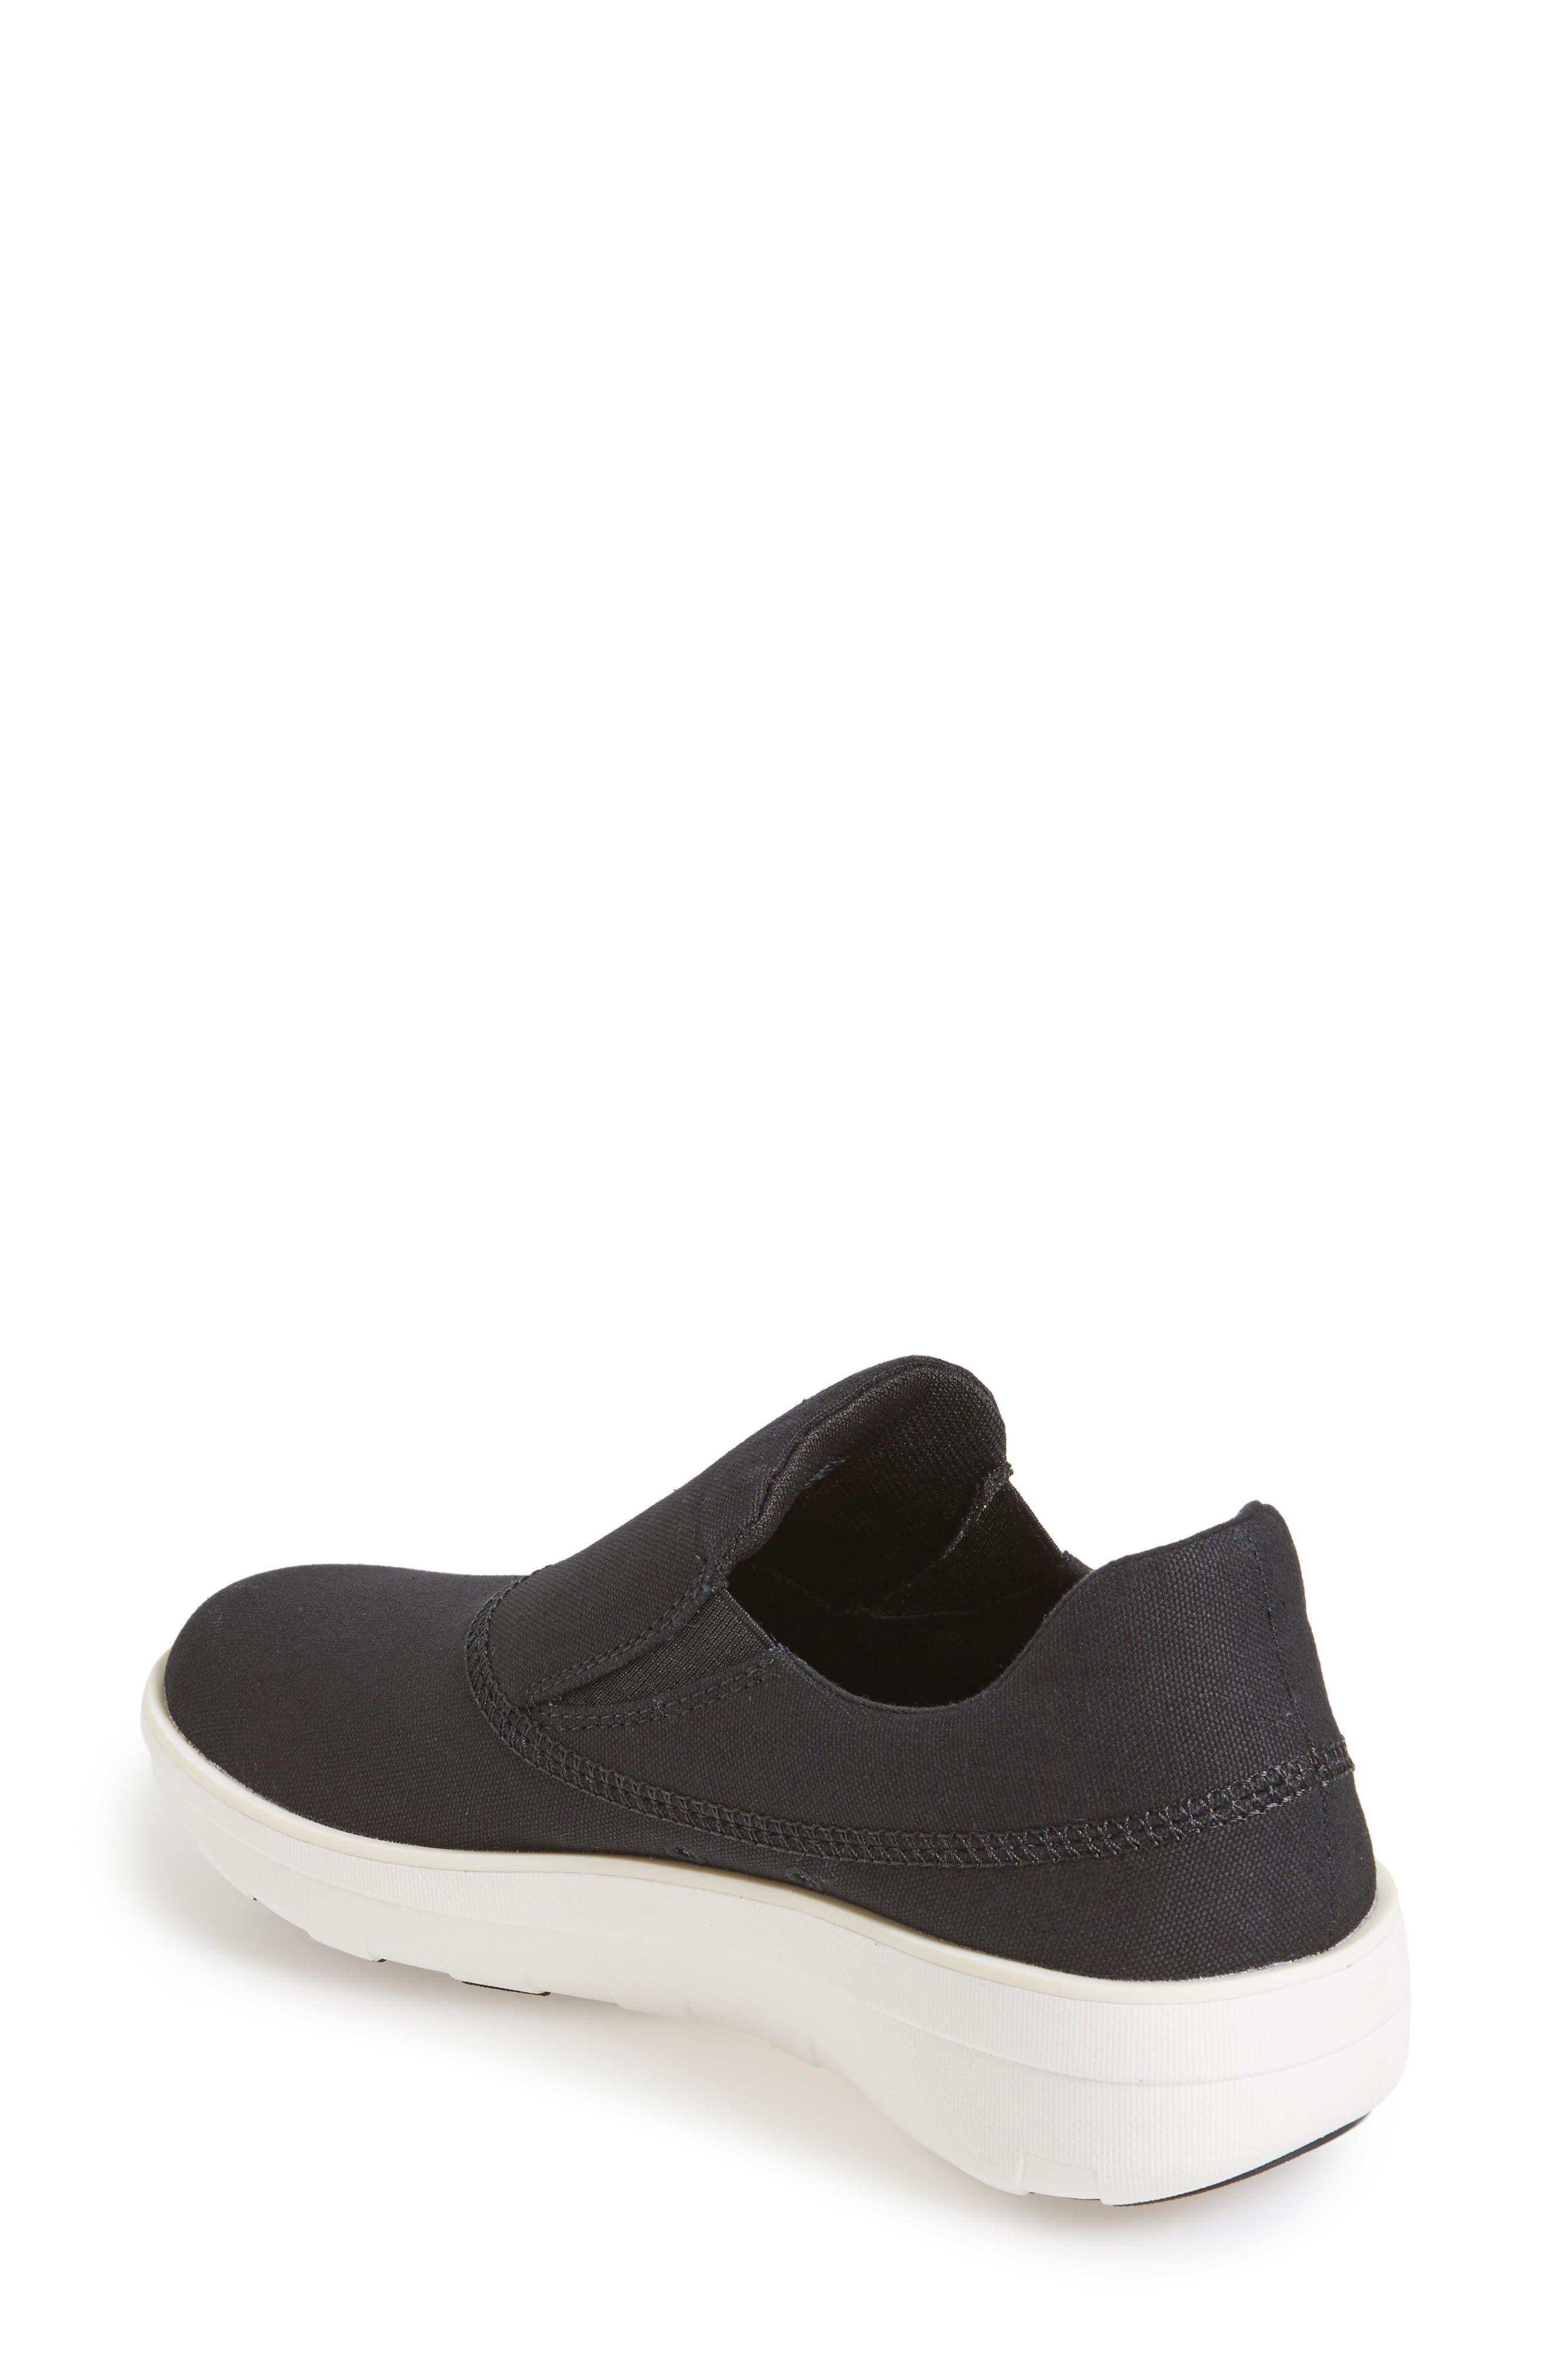 Alternate Image 2  - FitFlop Loaff Slip-On Sneaker